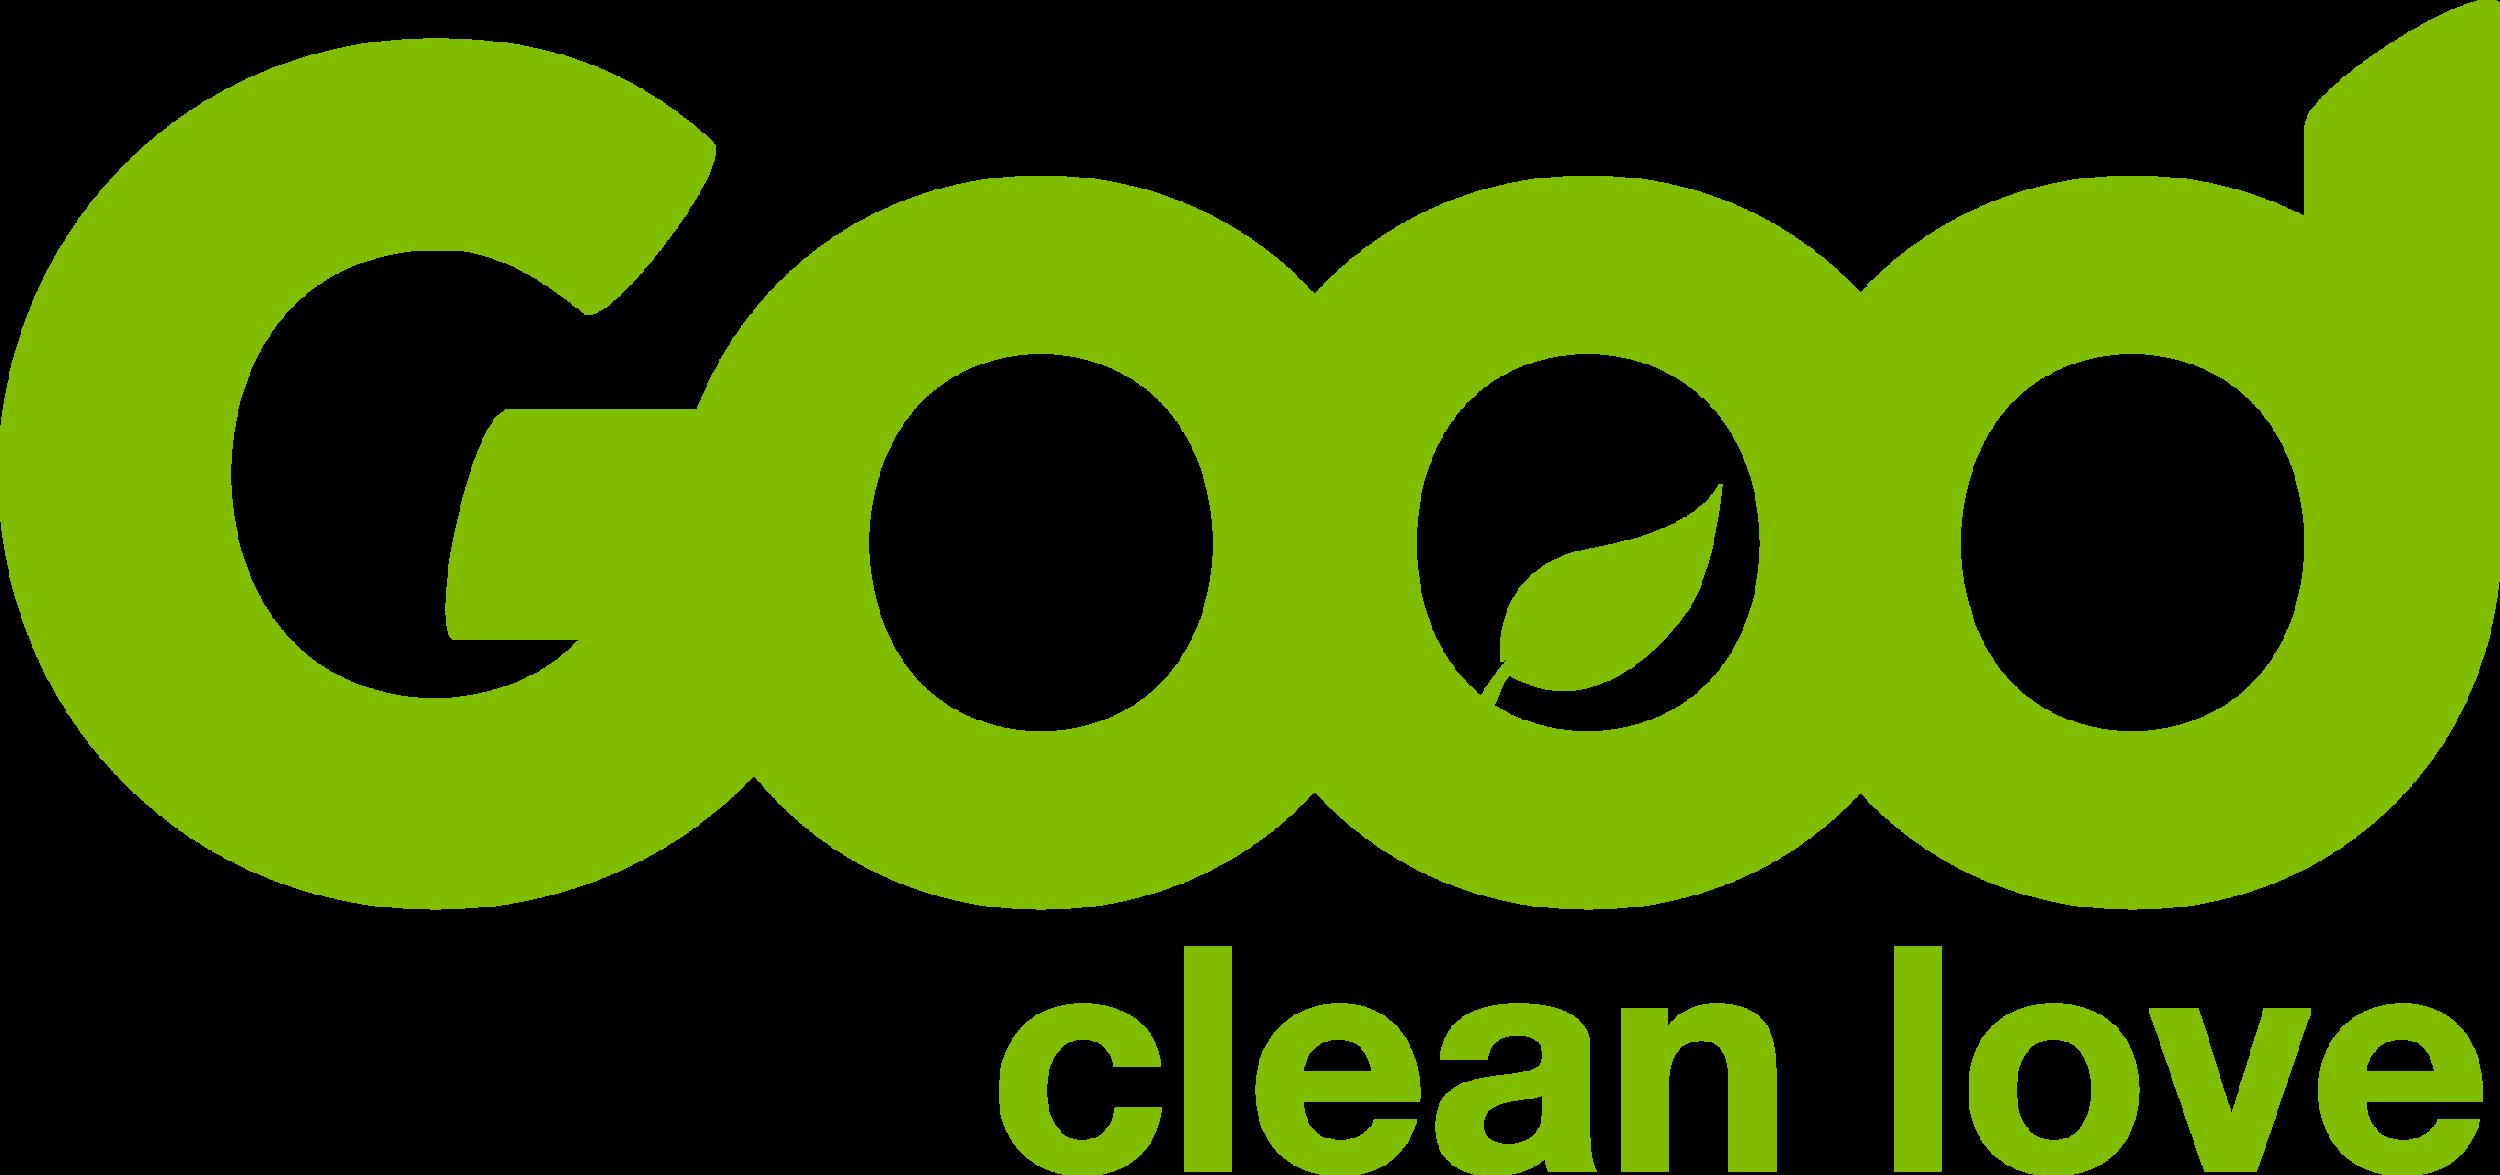 GCL Logo RGB 2019 green no birds.PNG